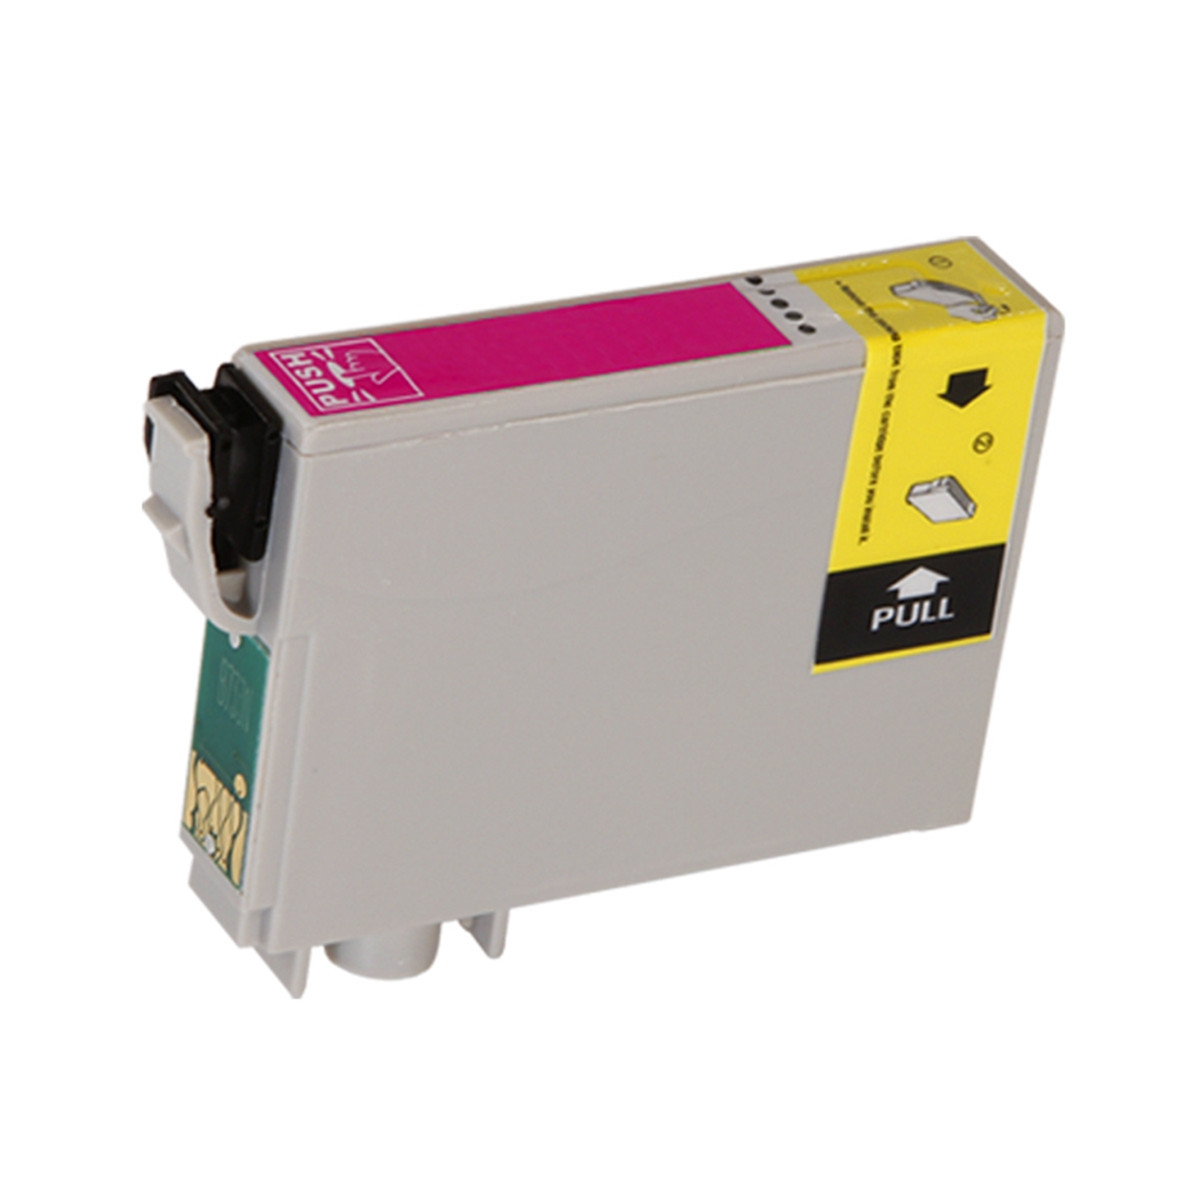 Kit com 10 Cartuchos de Tinta Compatível com Epson T073320 T073 Magenta T10 T20 TX200 TX209 12 ml